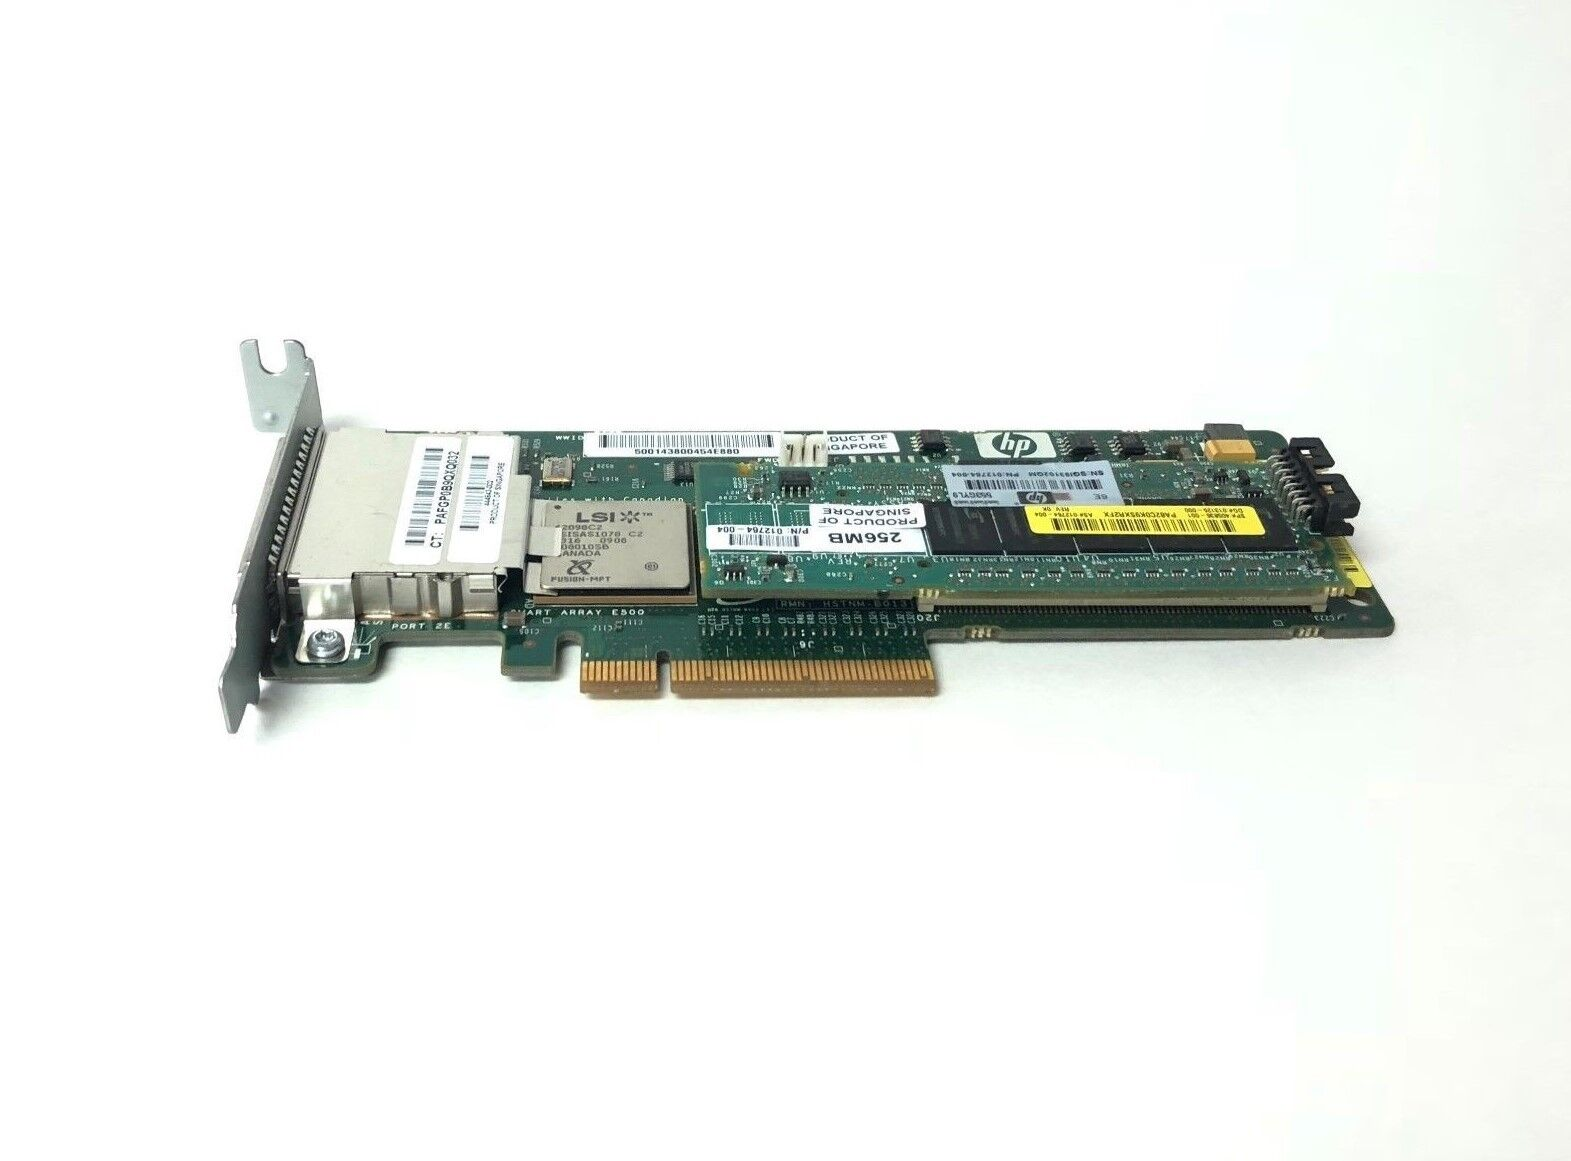 610673-003 HP Smart Array P420 Controller 633538-001 Low Profile No Cache